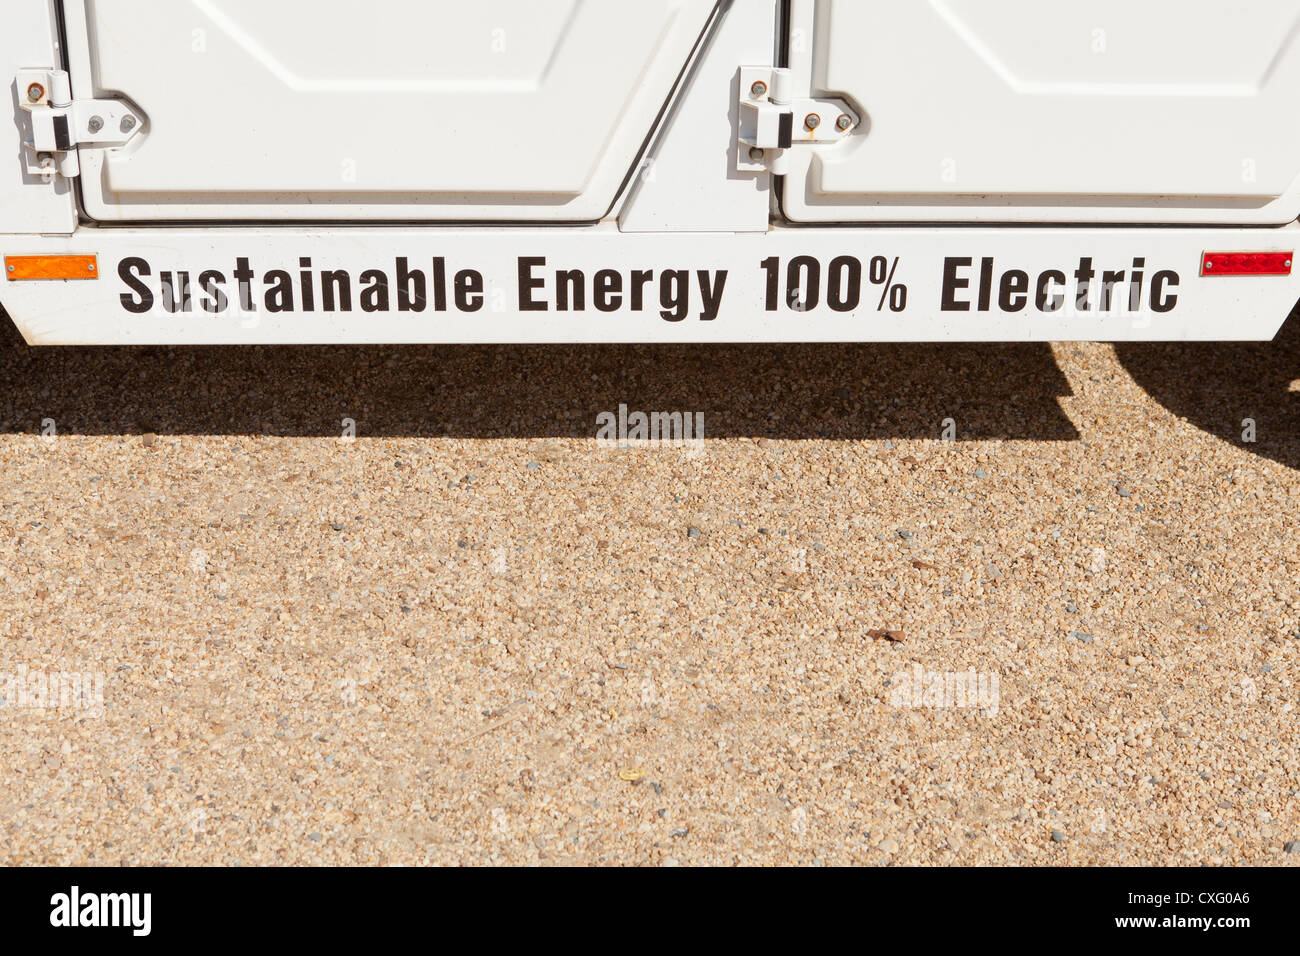 US Regierung Energieversorger Car - Washington, DC USA Stockbild